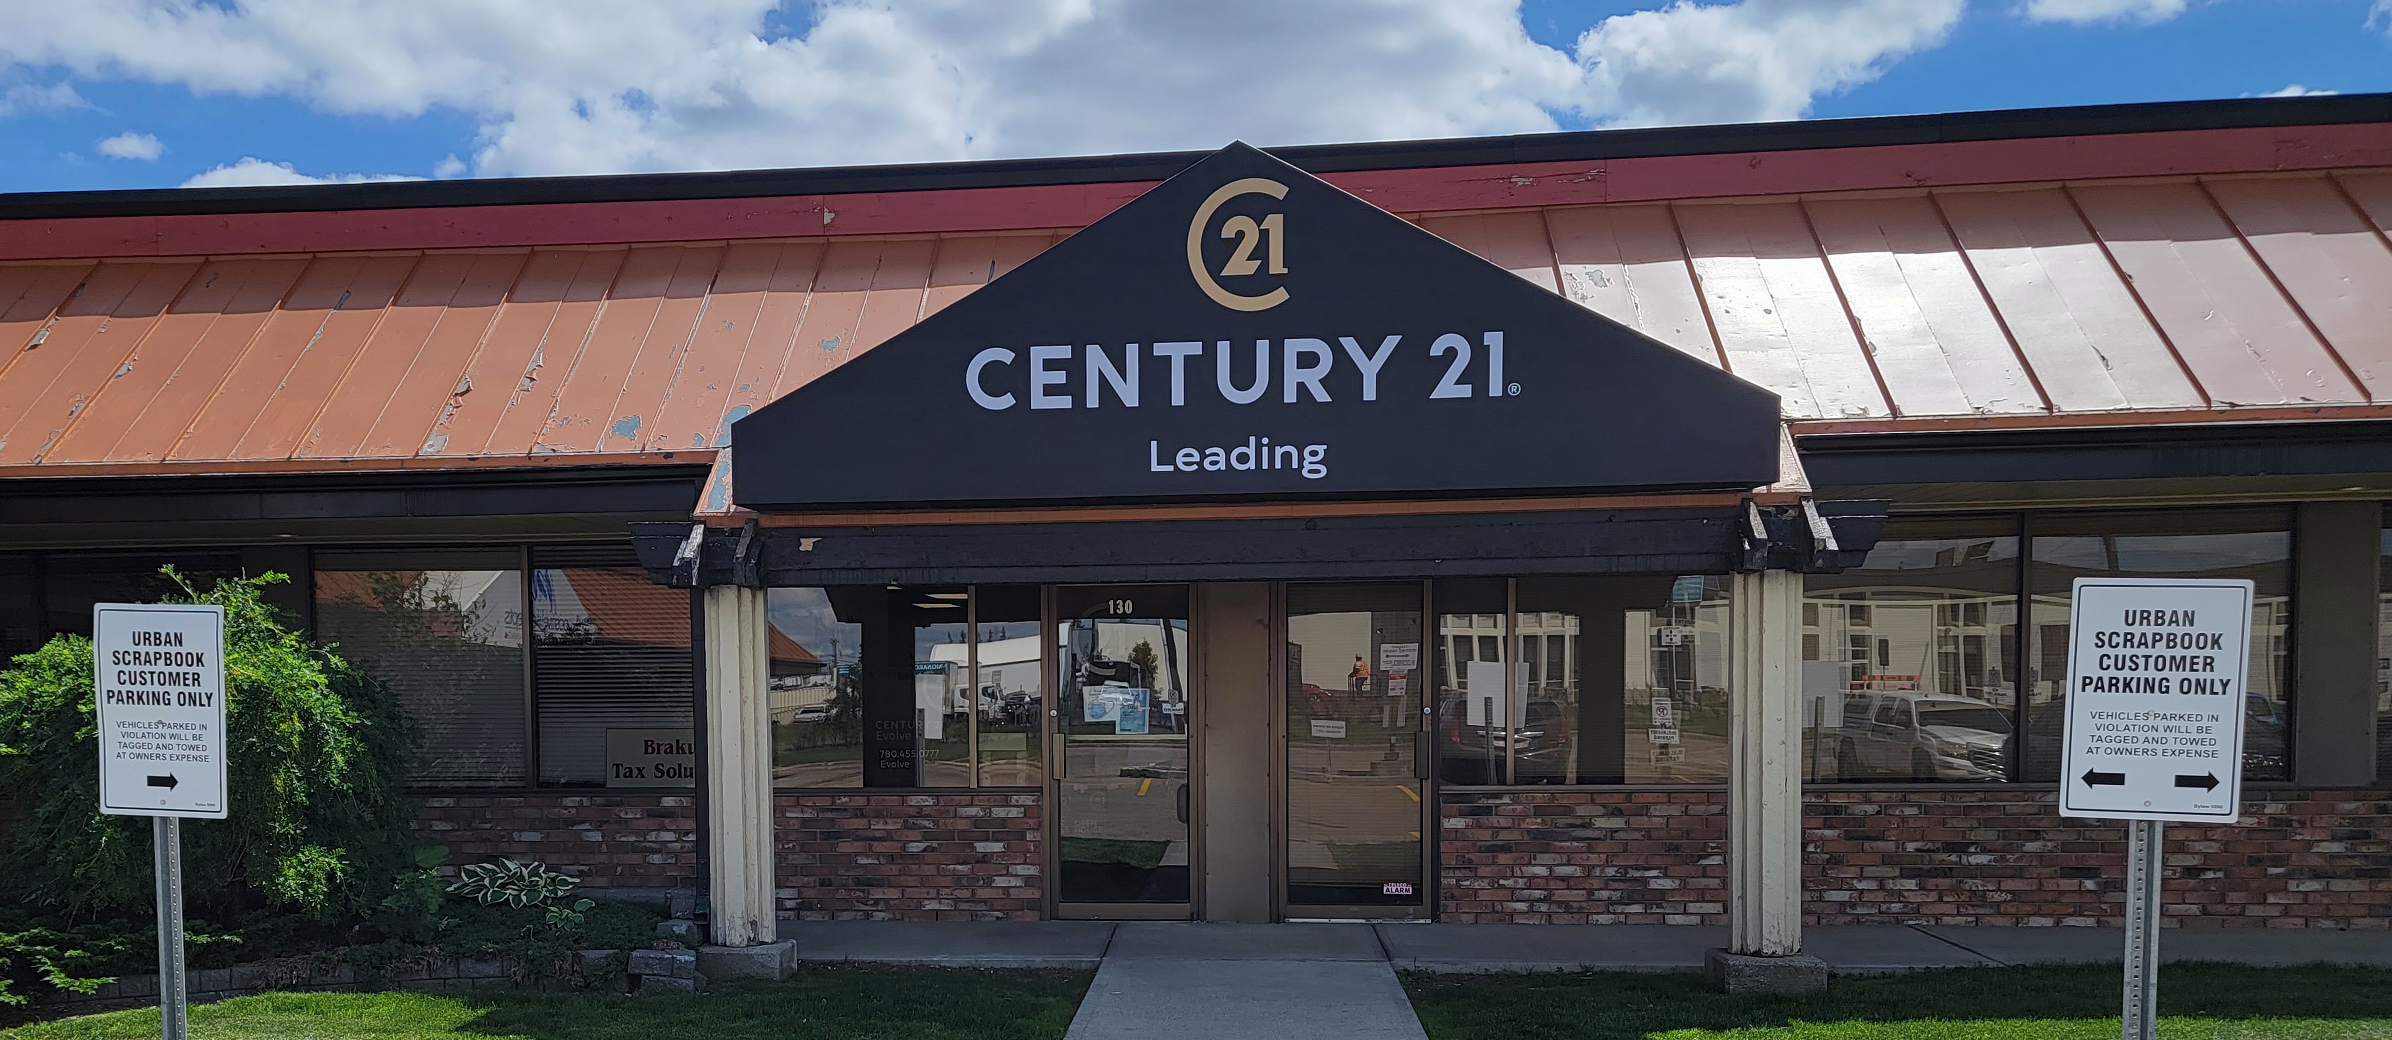 CENTURY 21 Leading Grows in Edmonton